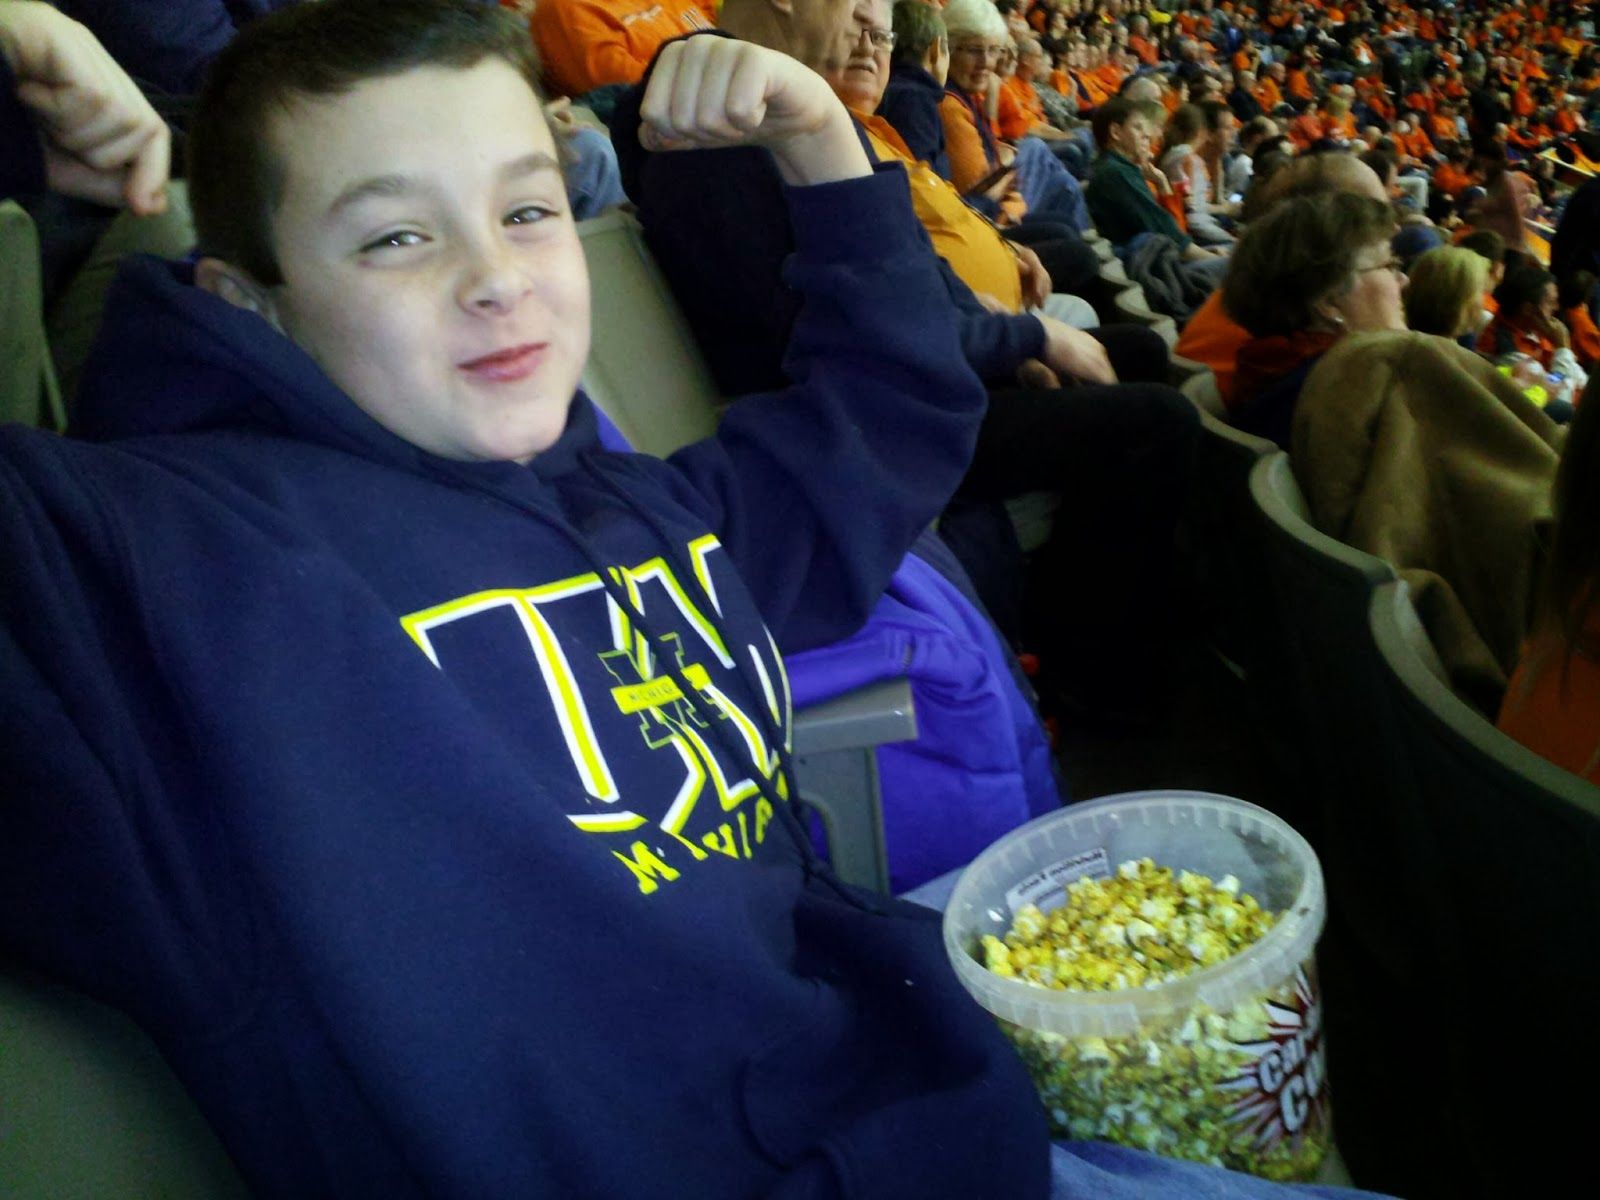 Popcorn king!